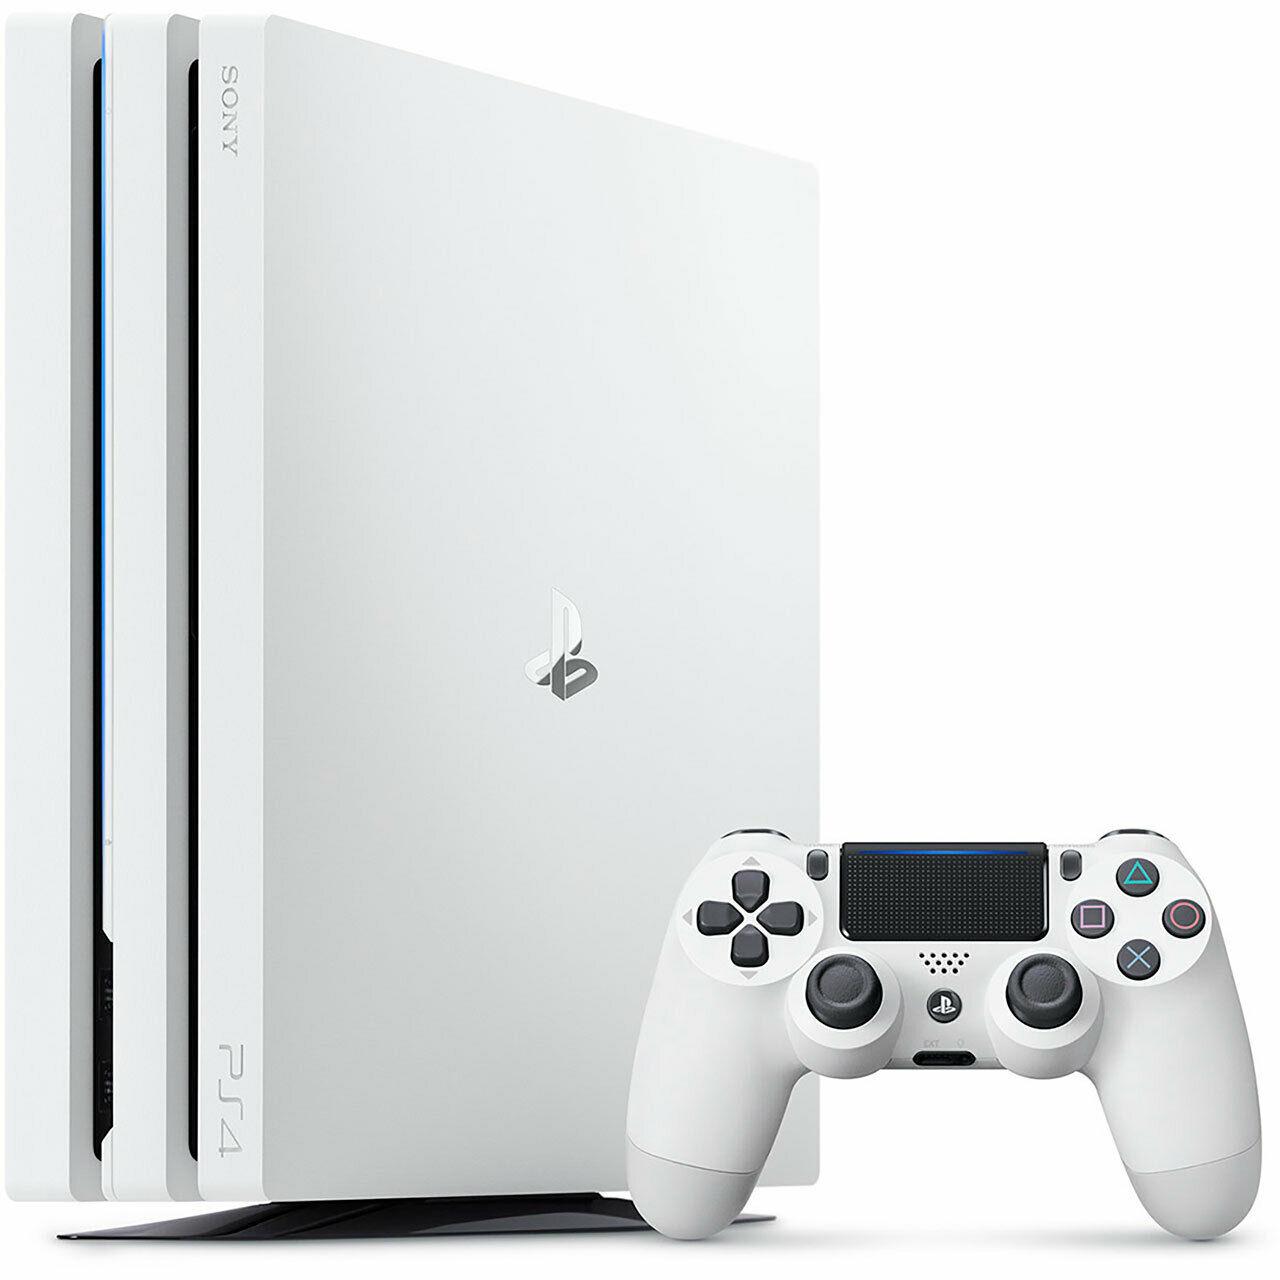 PS4 PlayStation 4 Pro White 1TB @ AO eBay £279.00 using code